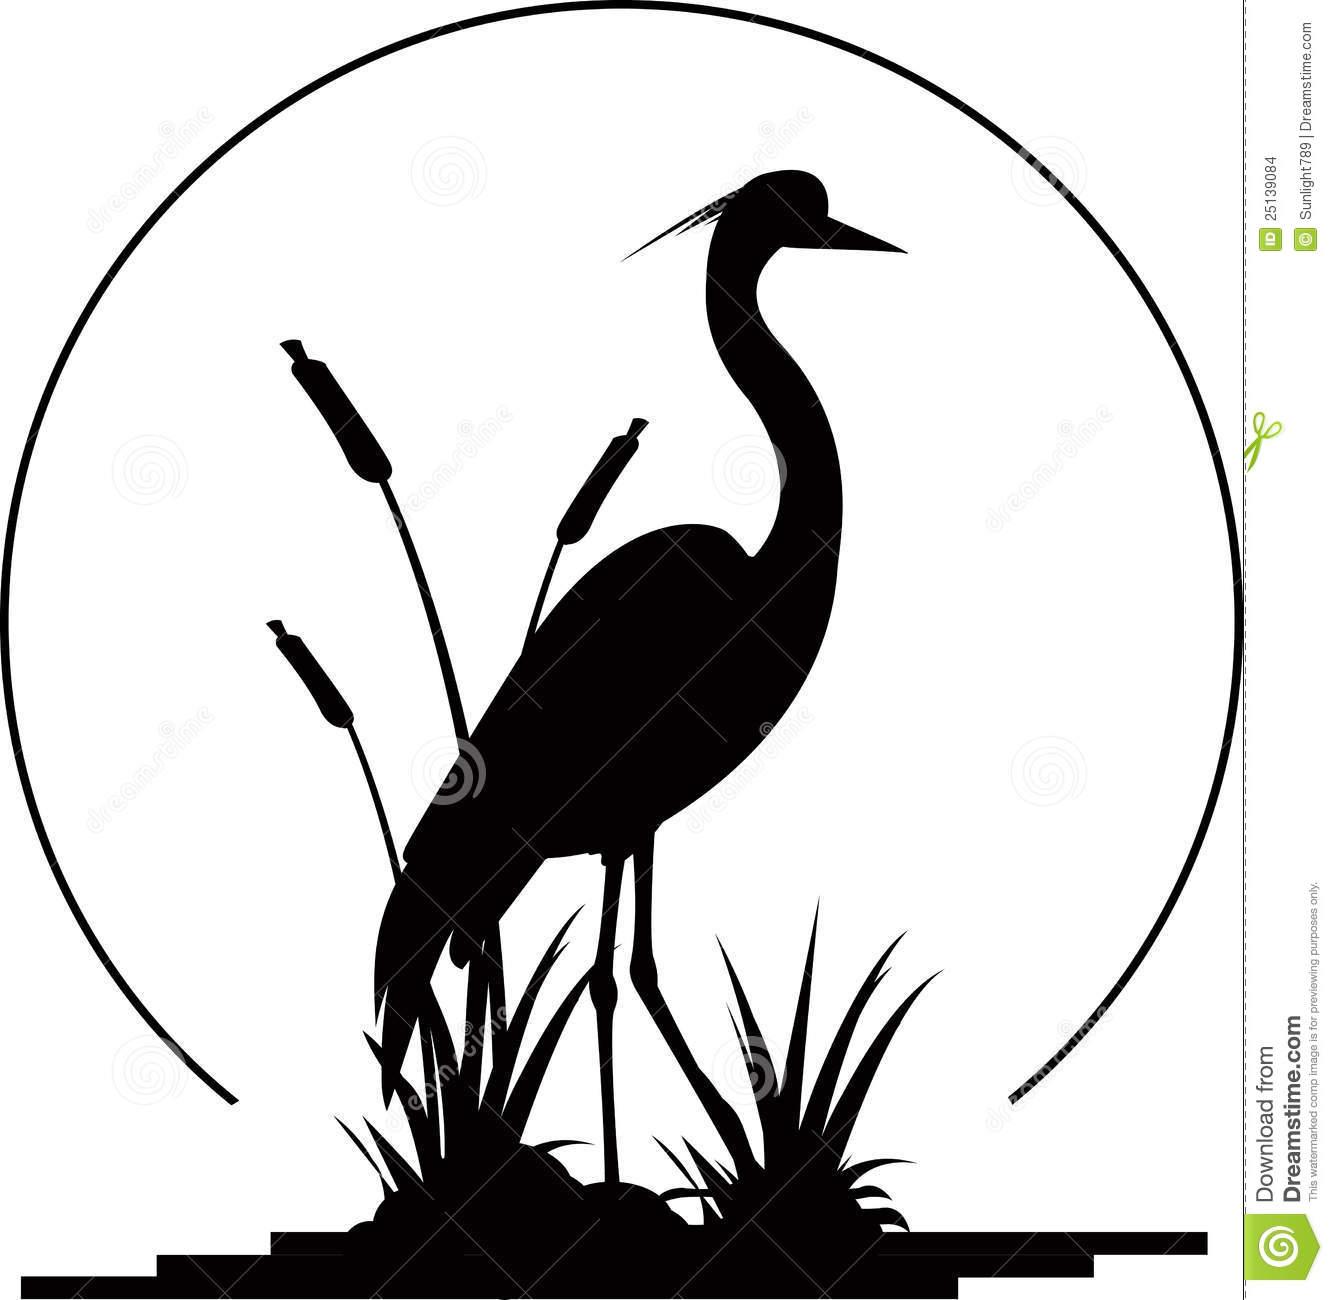 1333x1300 Images For Gt Flying Egret Clipart Flamingo Flamand Rose Art